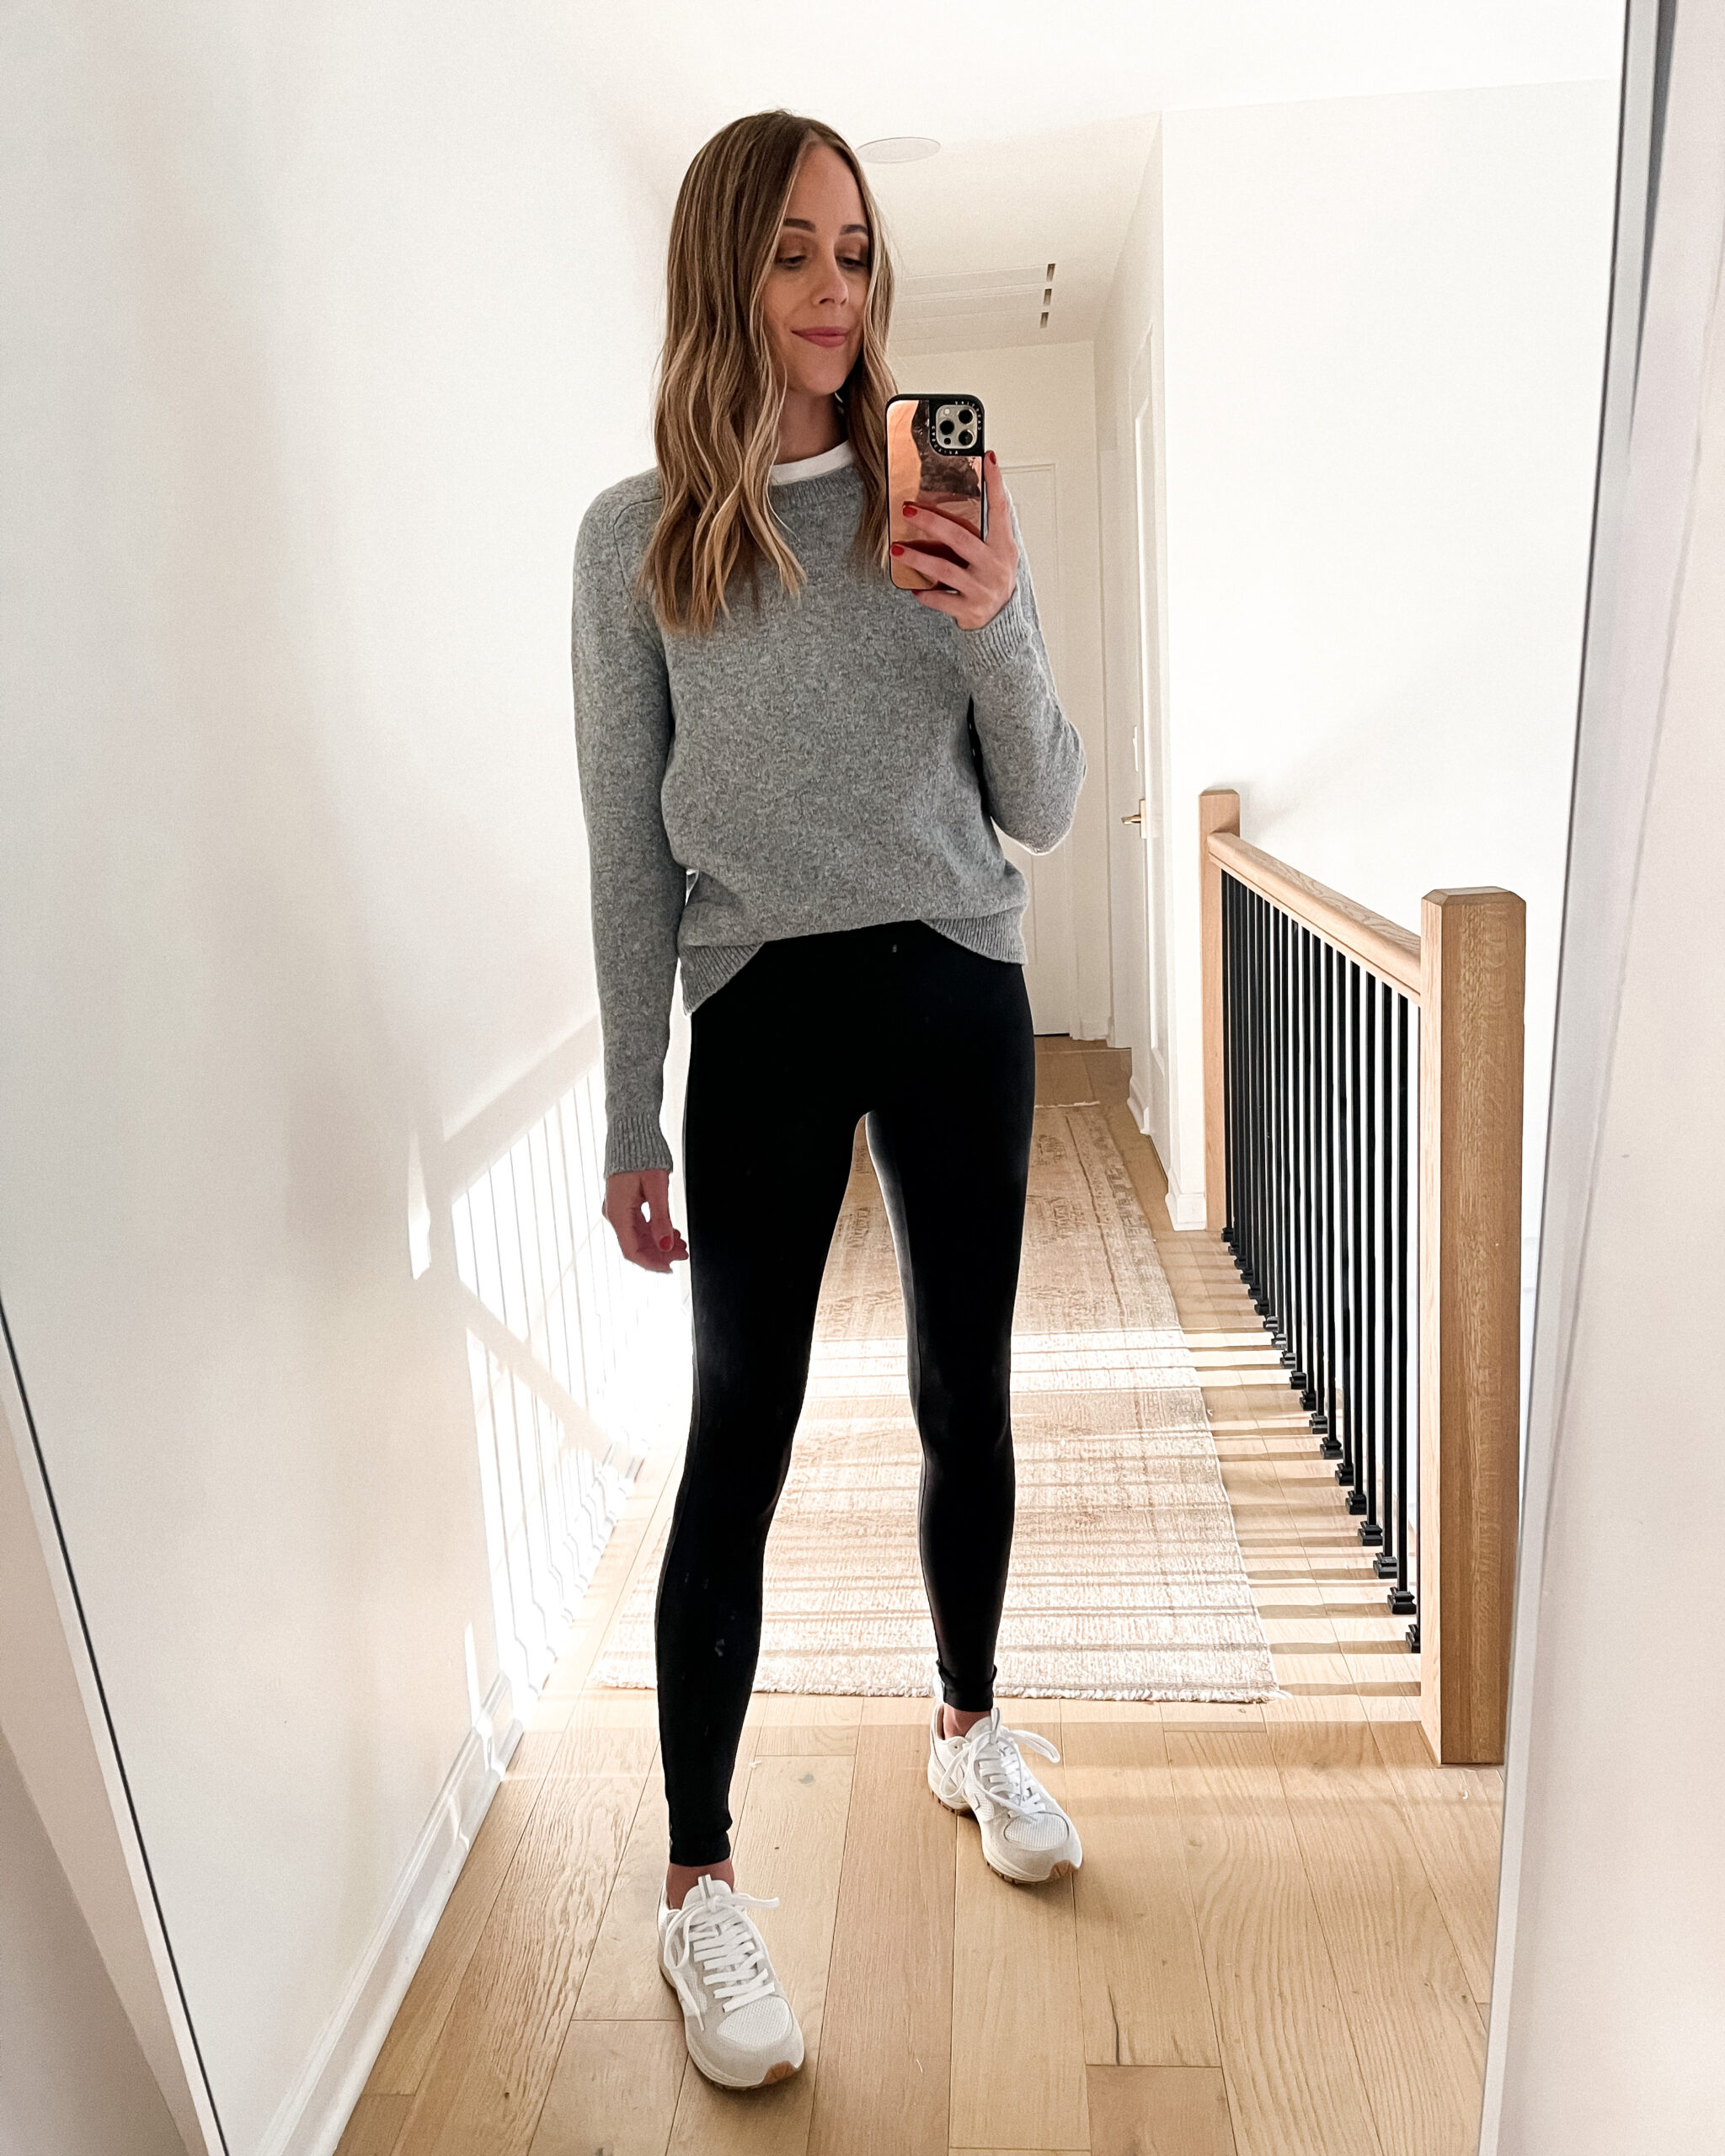 Fashion Jackson Wearing Amazon Fashion Grey Sweater Black Leggings White Dad Sneakers